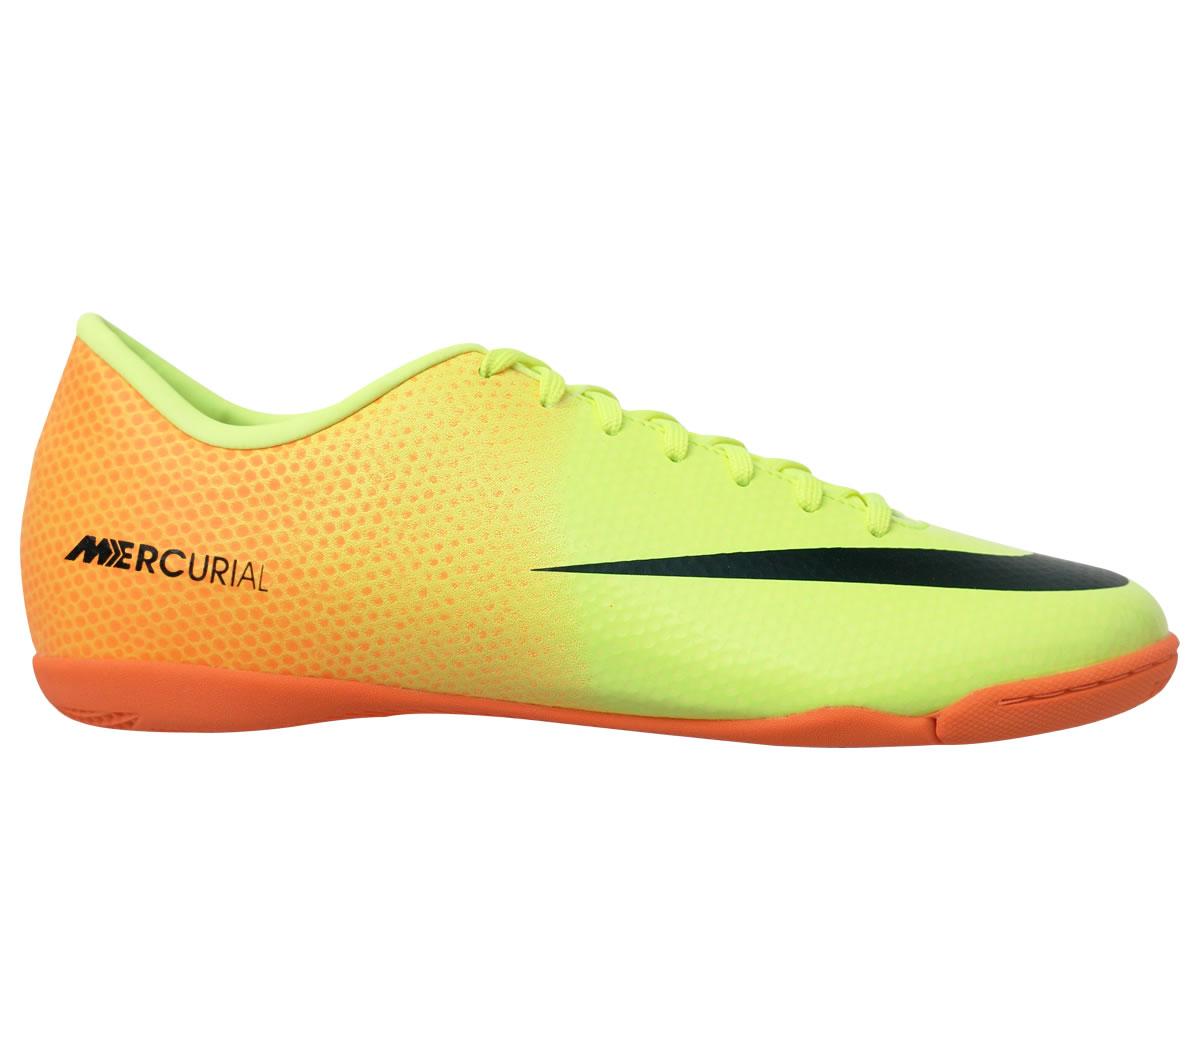 Tênis Nike Mercurial Victory IV Futsal Amarelo e Laranja - Mundo do ... 66653b6250318